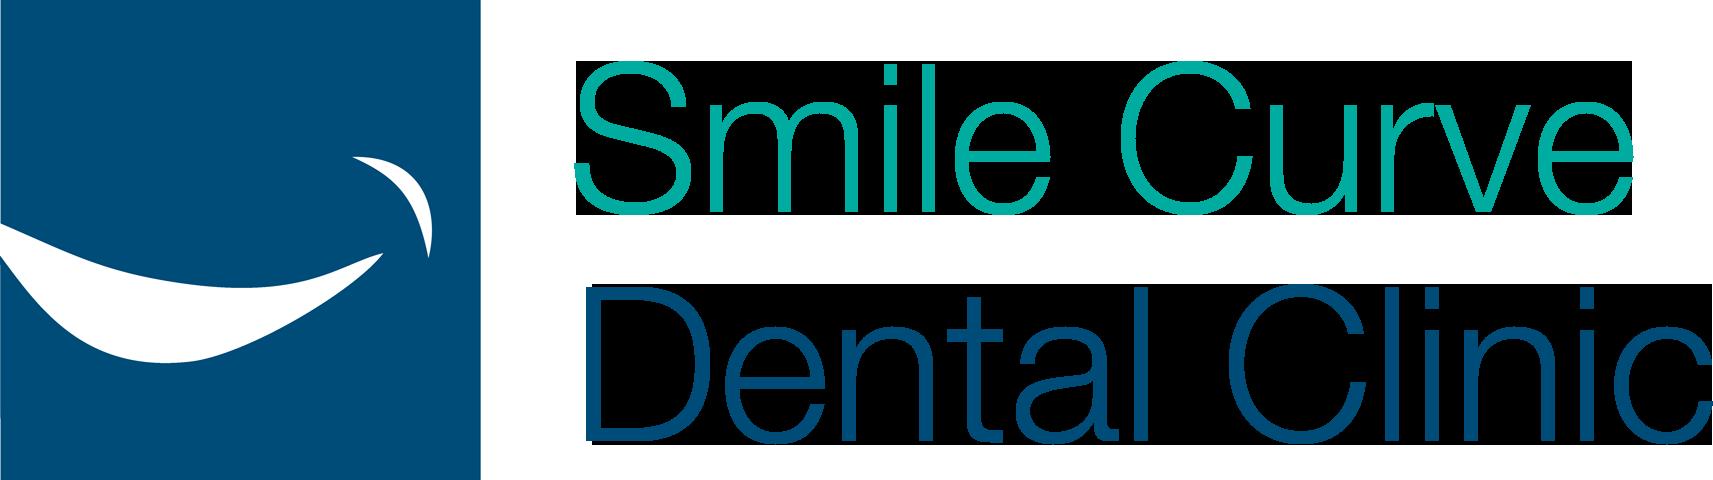 Smile Curve Dental Clinic